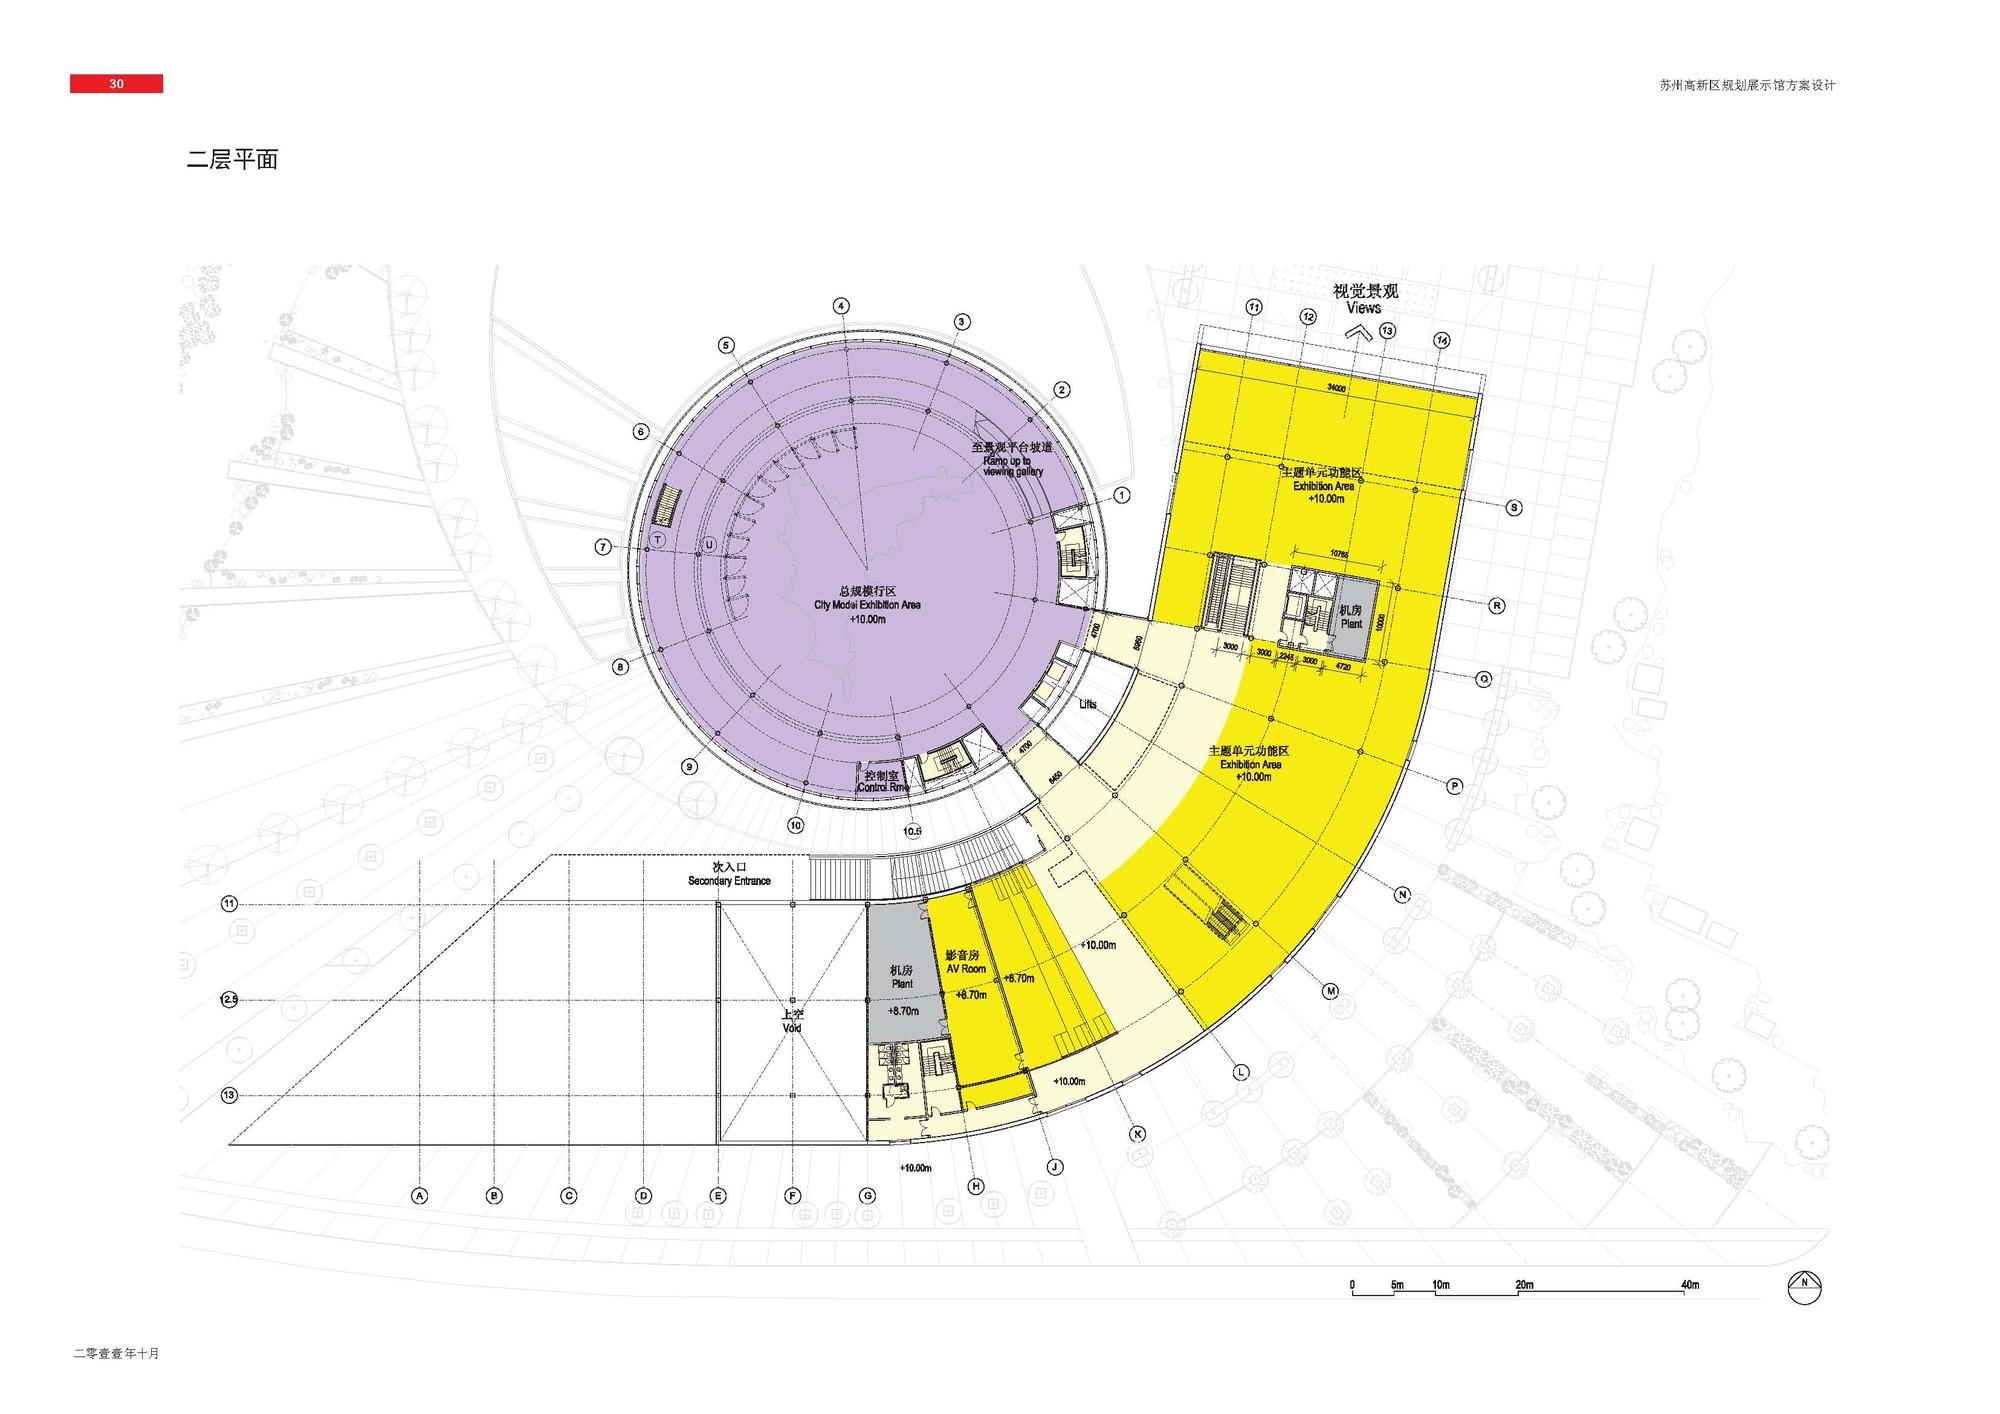 D Exhibition Floor Plan : Gallery of suzhou snd district urban planning exhibition